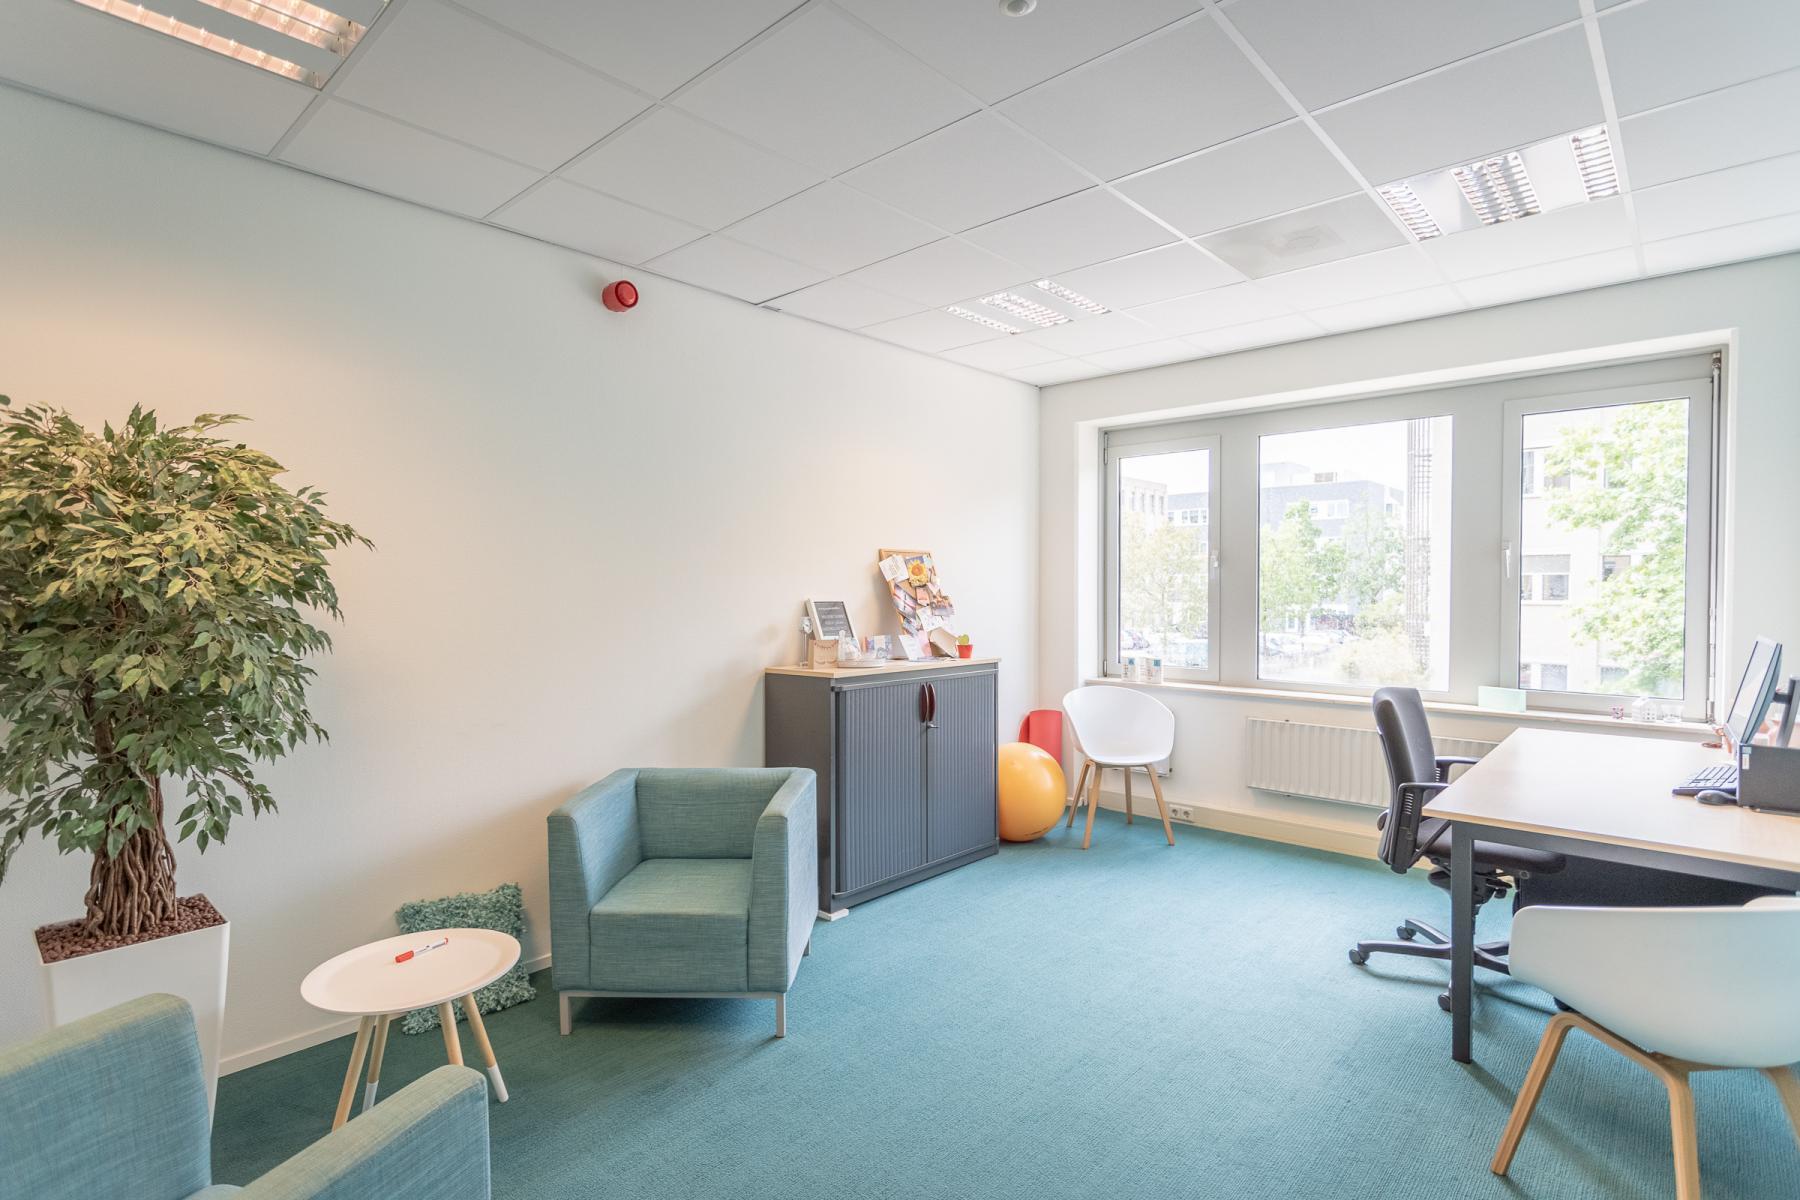 Rent office space Dokter Stolteweg 42, Zwolle (6)